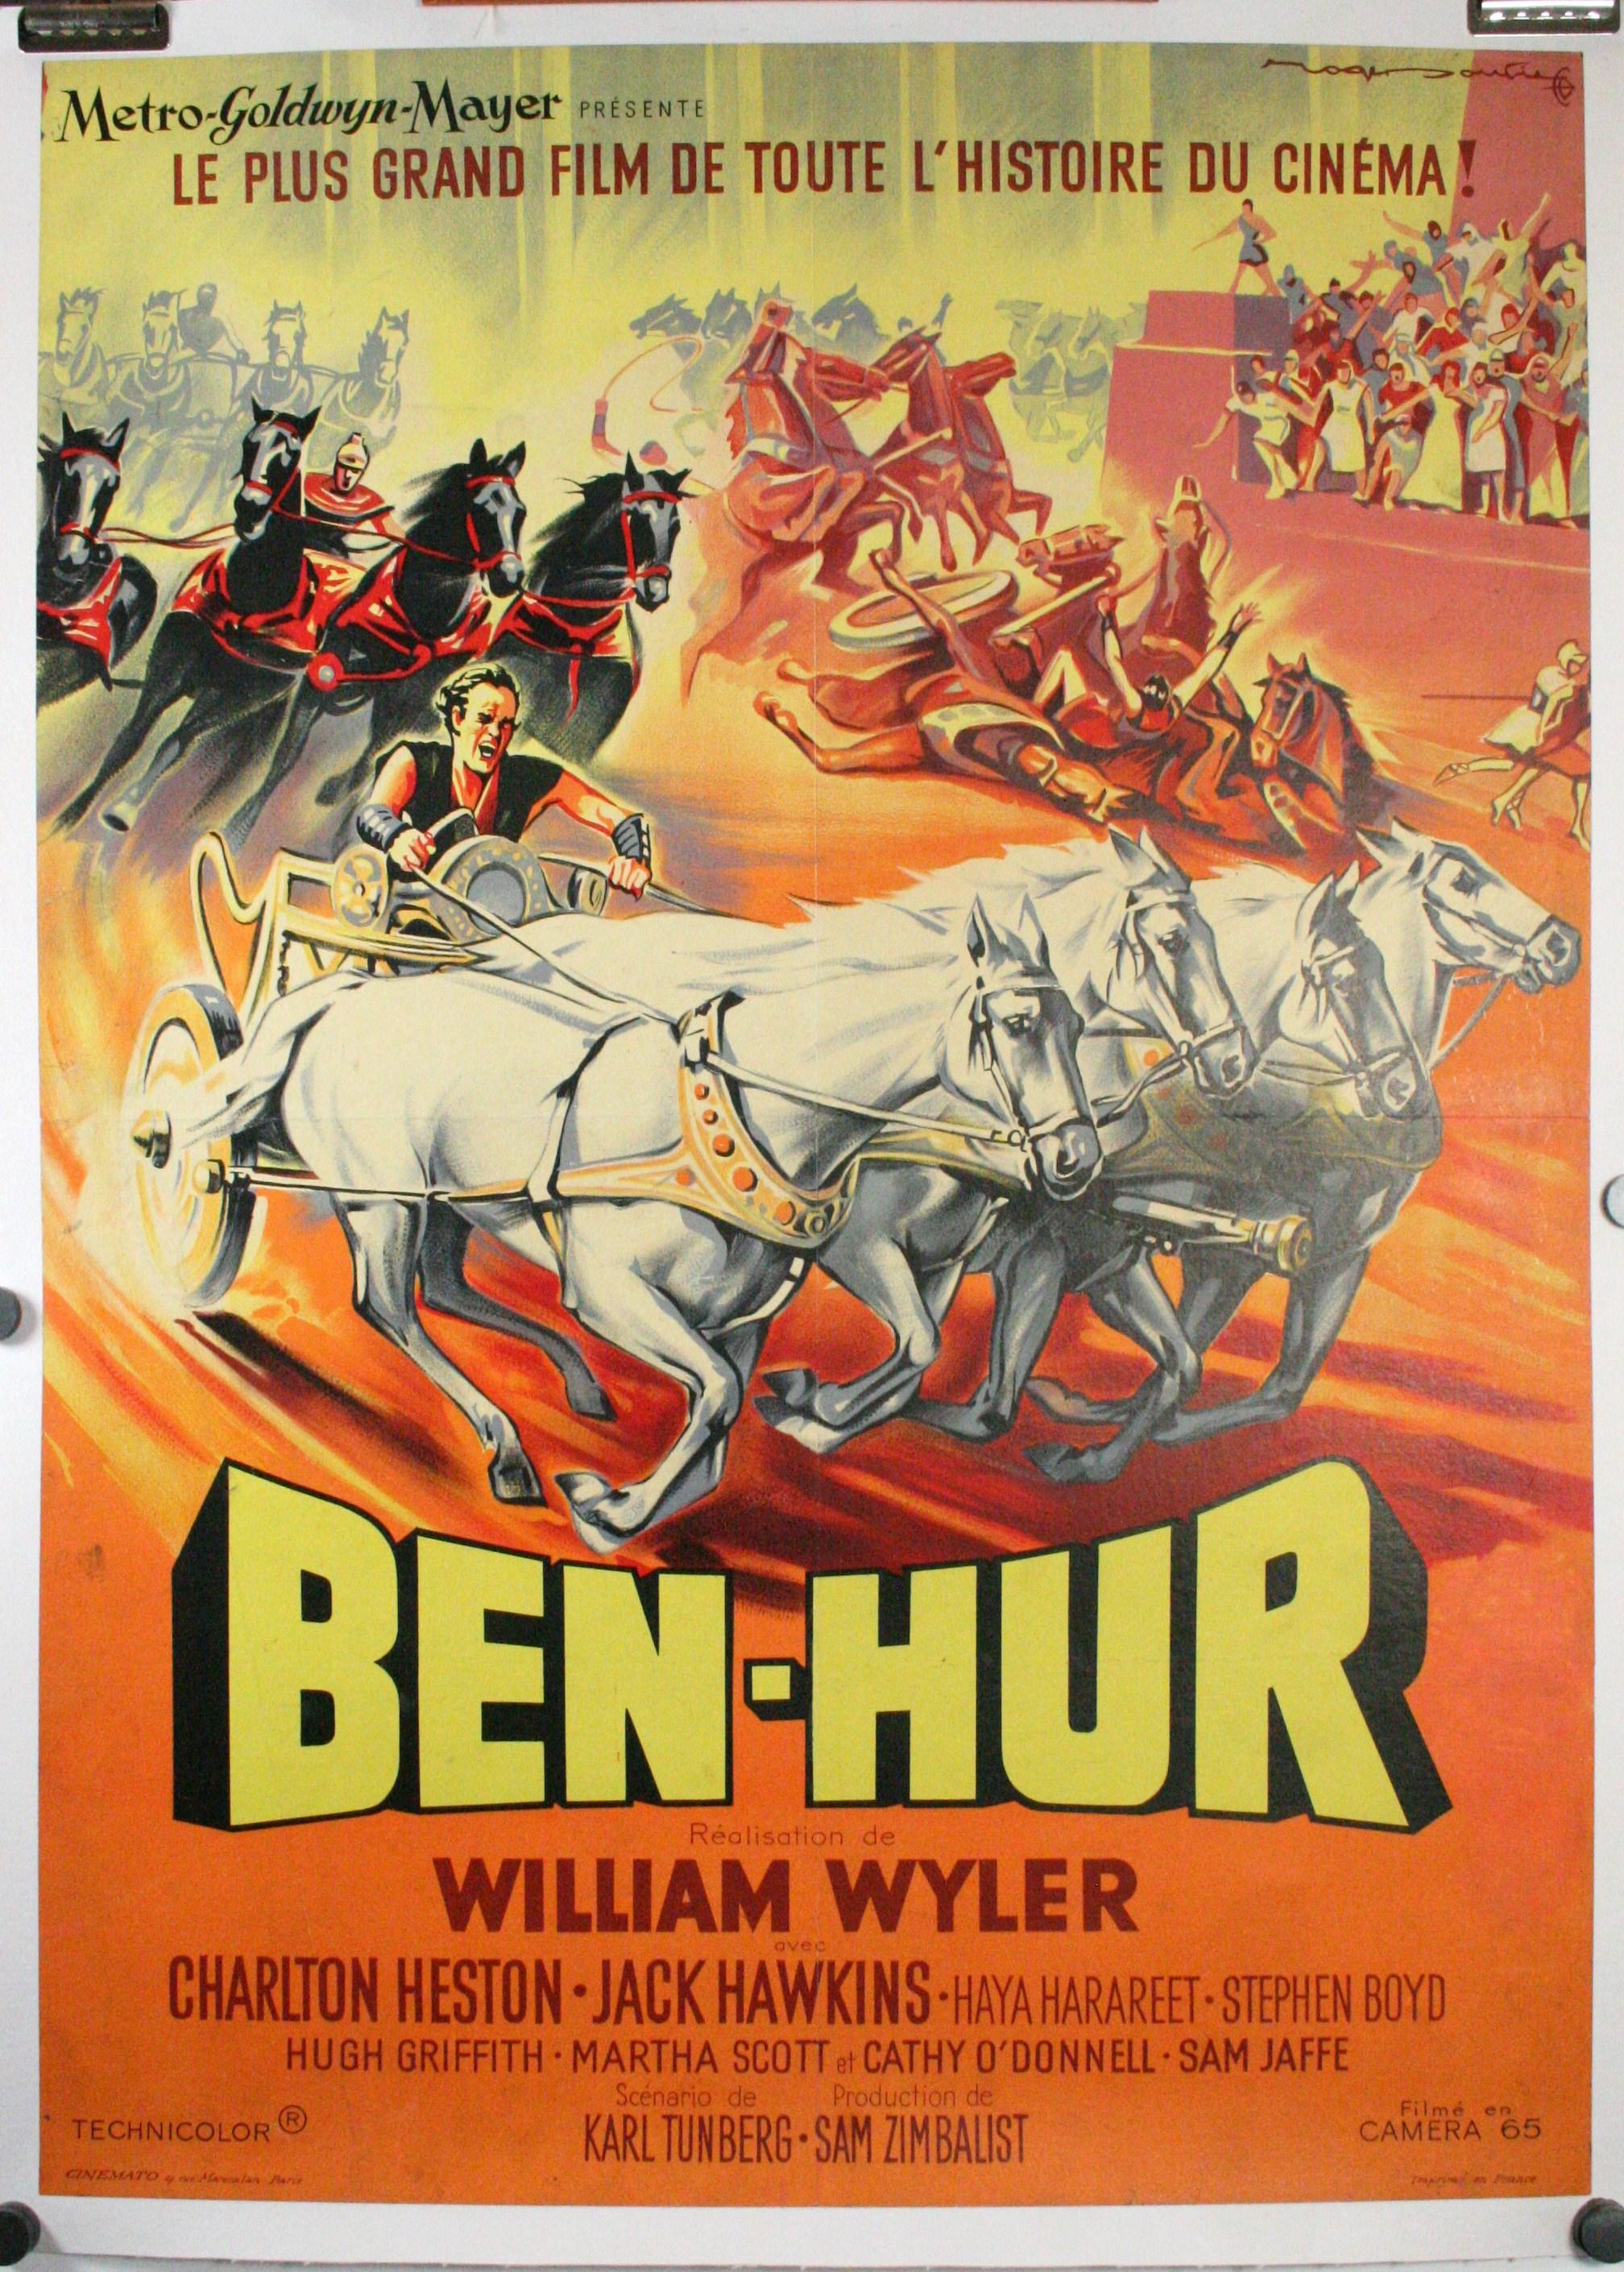 BEN HUR, Original French Medium Poster on linen